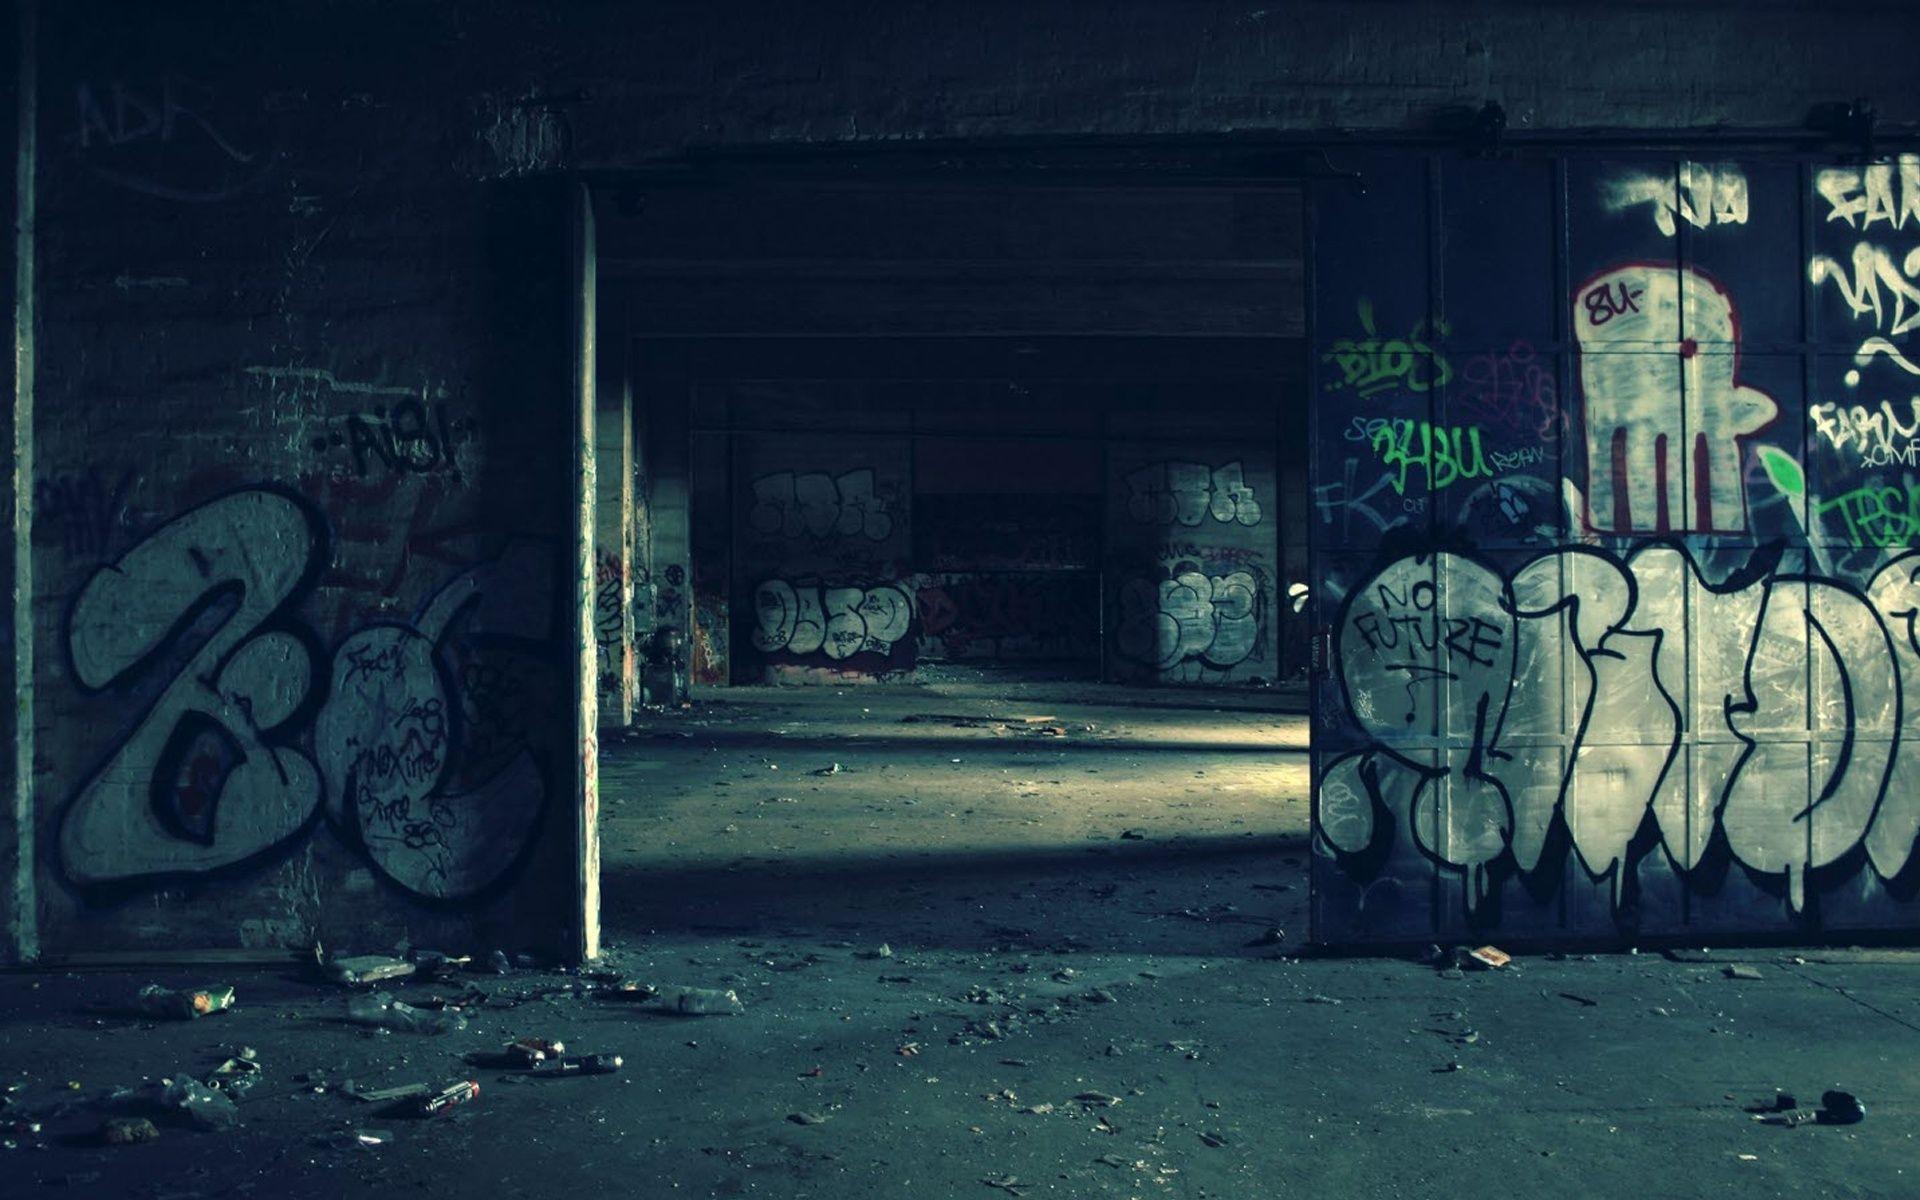 Graffiti wallpaper hd wallpapers pinterest graffiti graffiti wallpaper hd voltagebd Image collections